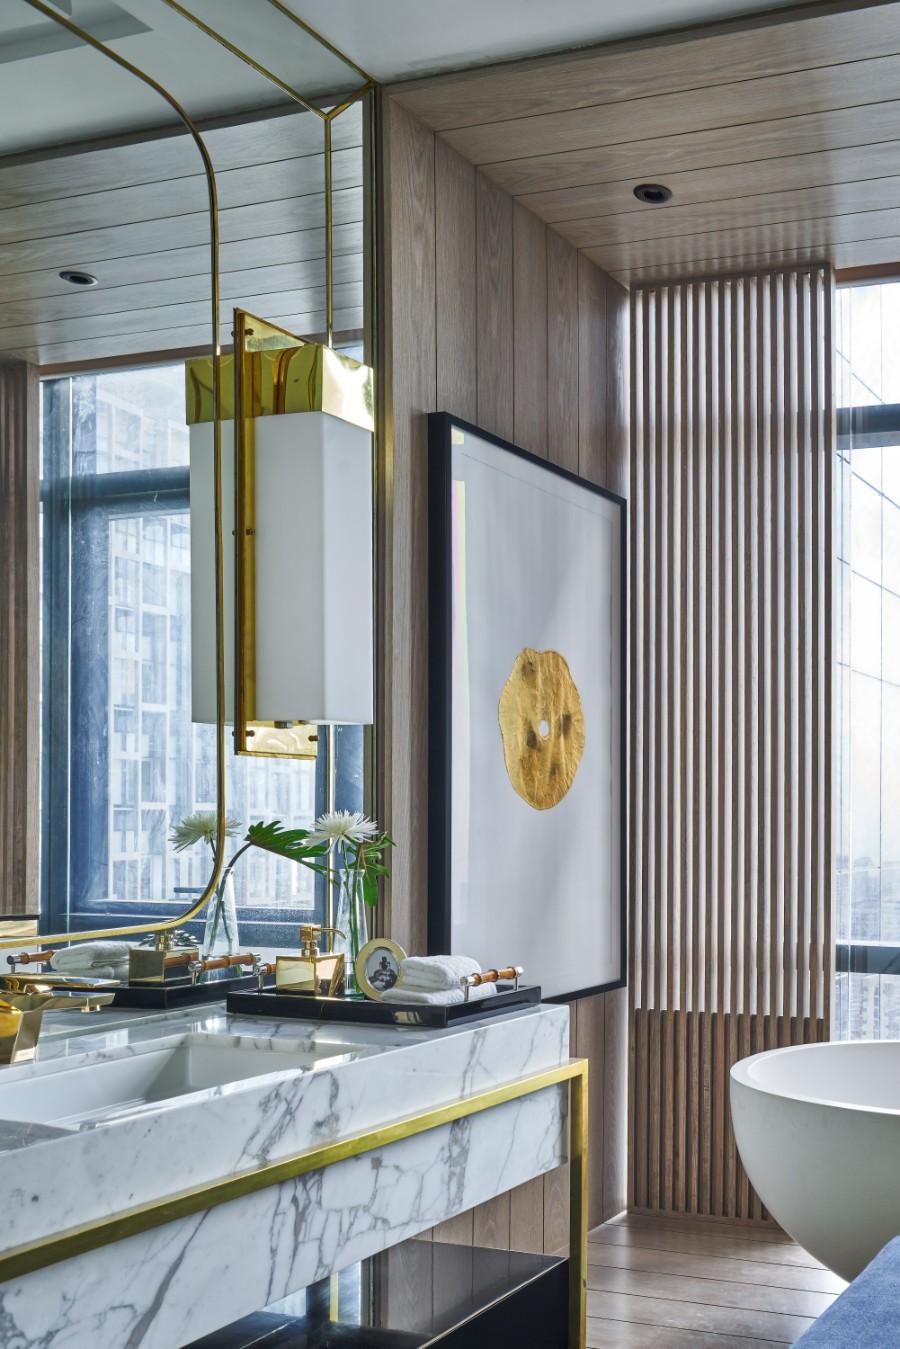 exclusive design Exclusive Design: Altamount Residence by Hirsch Bedner Associates Inside Altamount Residence by Hirsch Bedner Associates 28